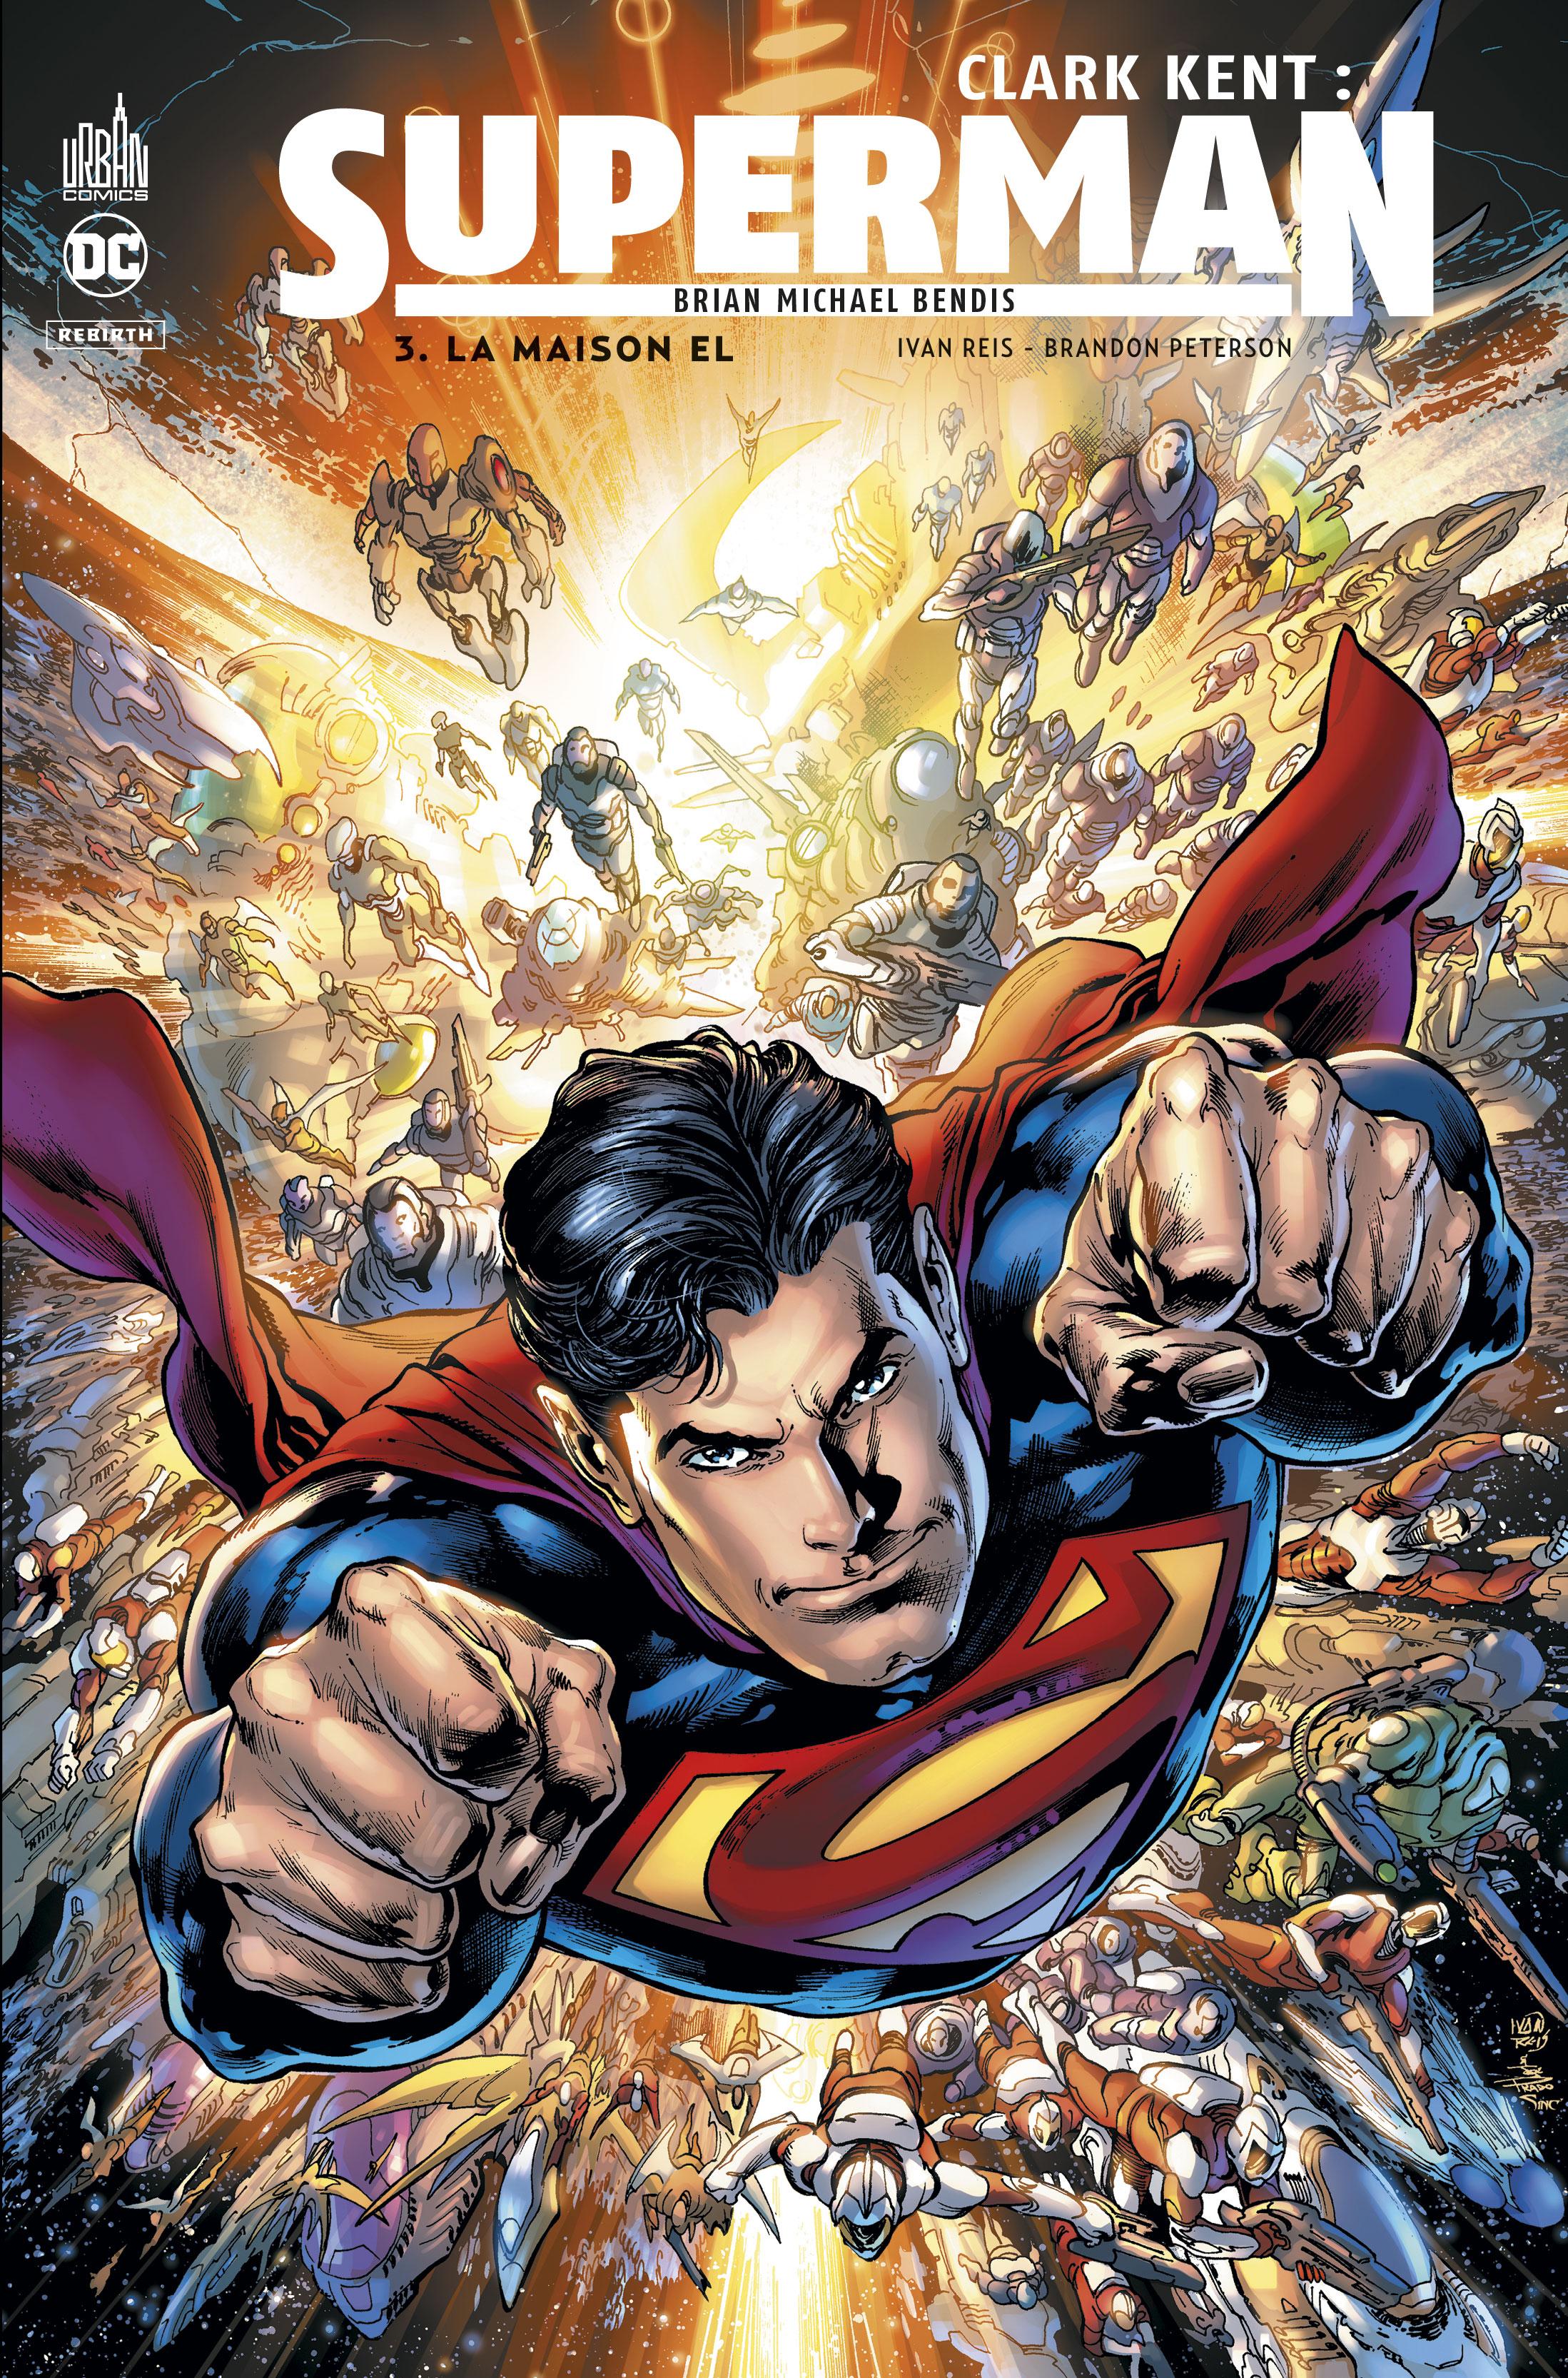 Clark Kent - Superman 3 - La maison El